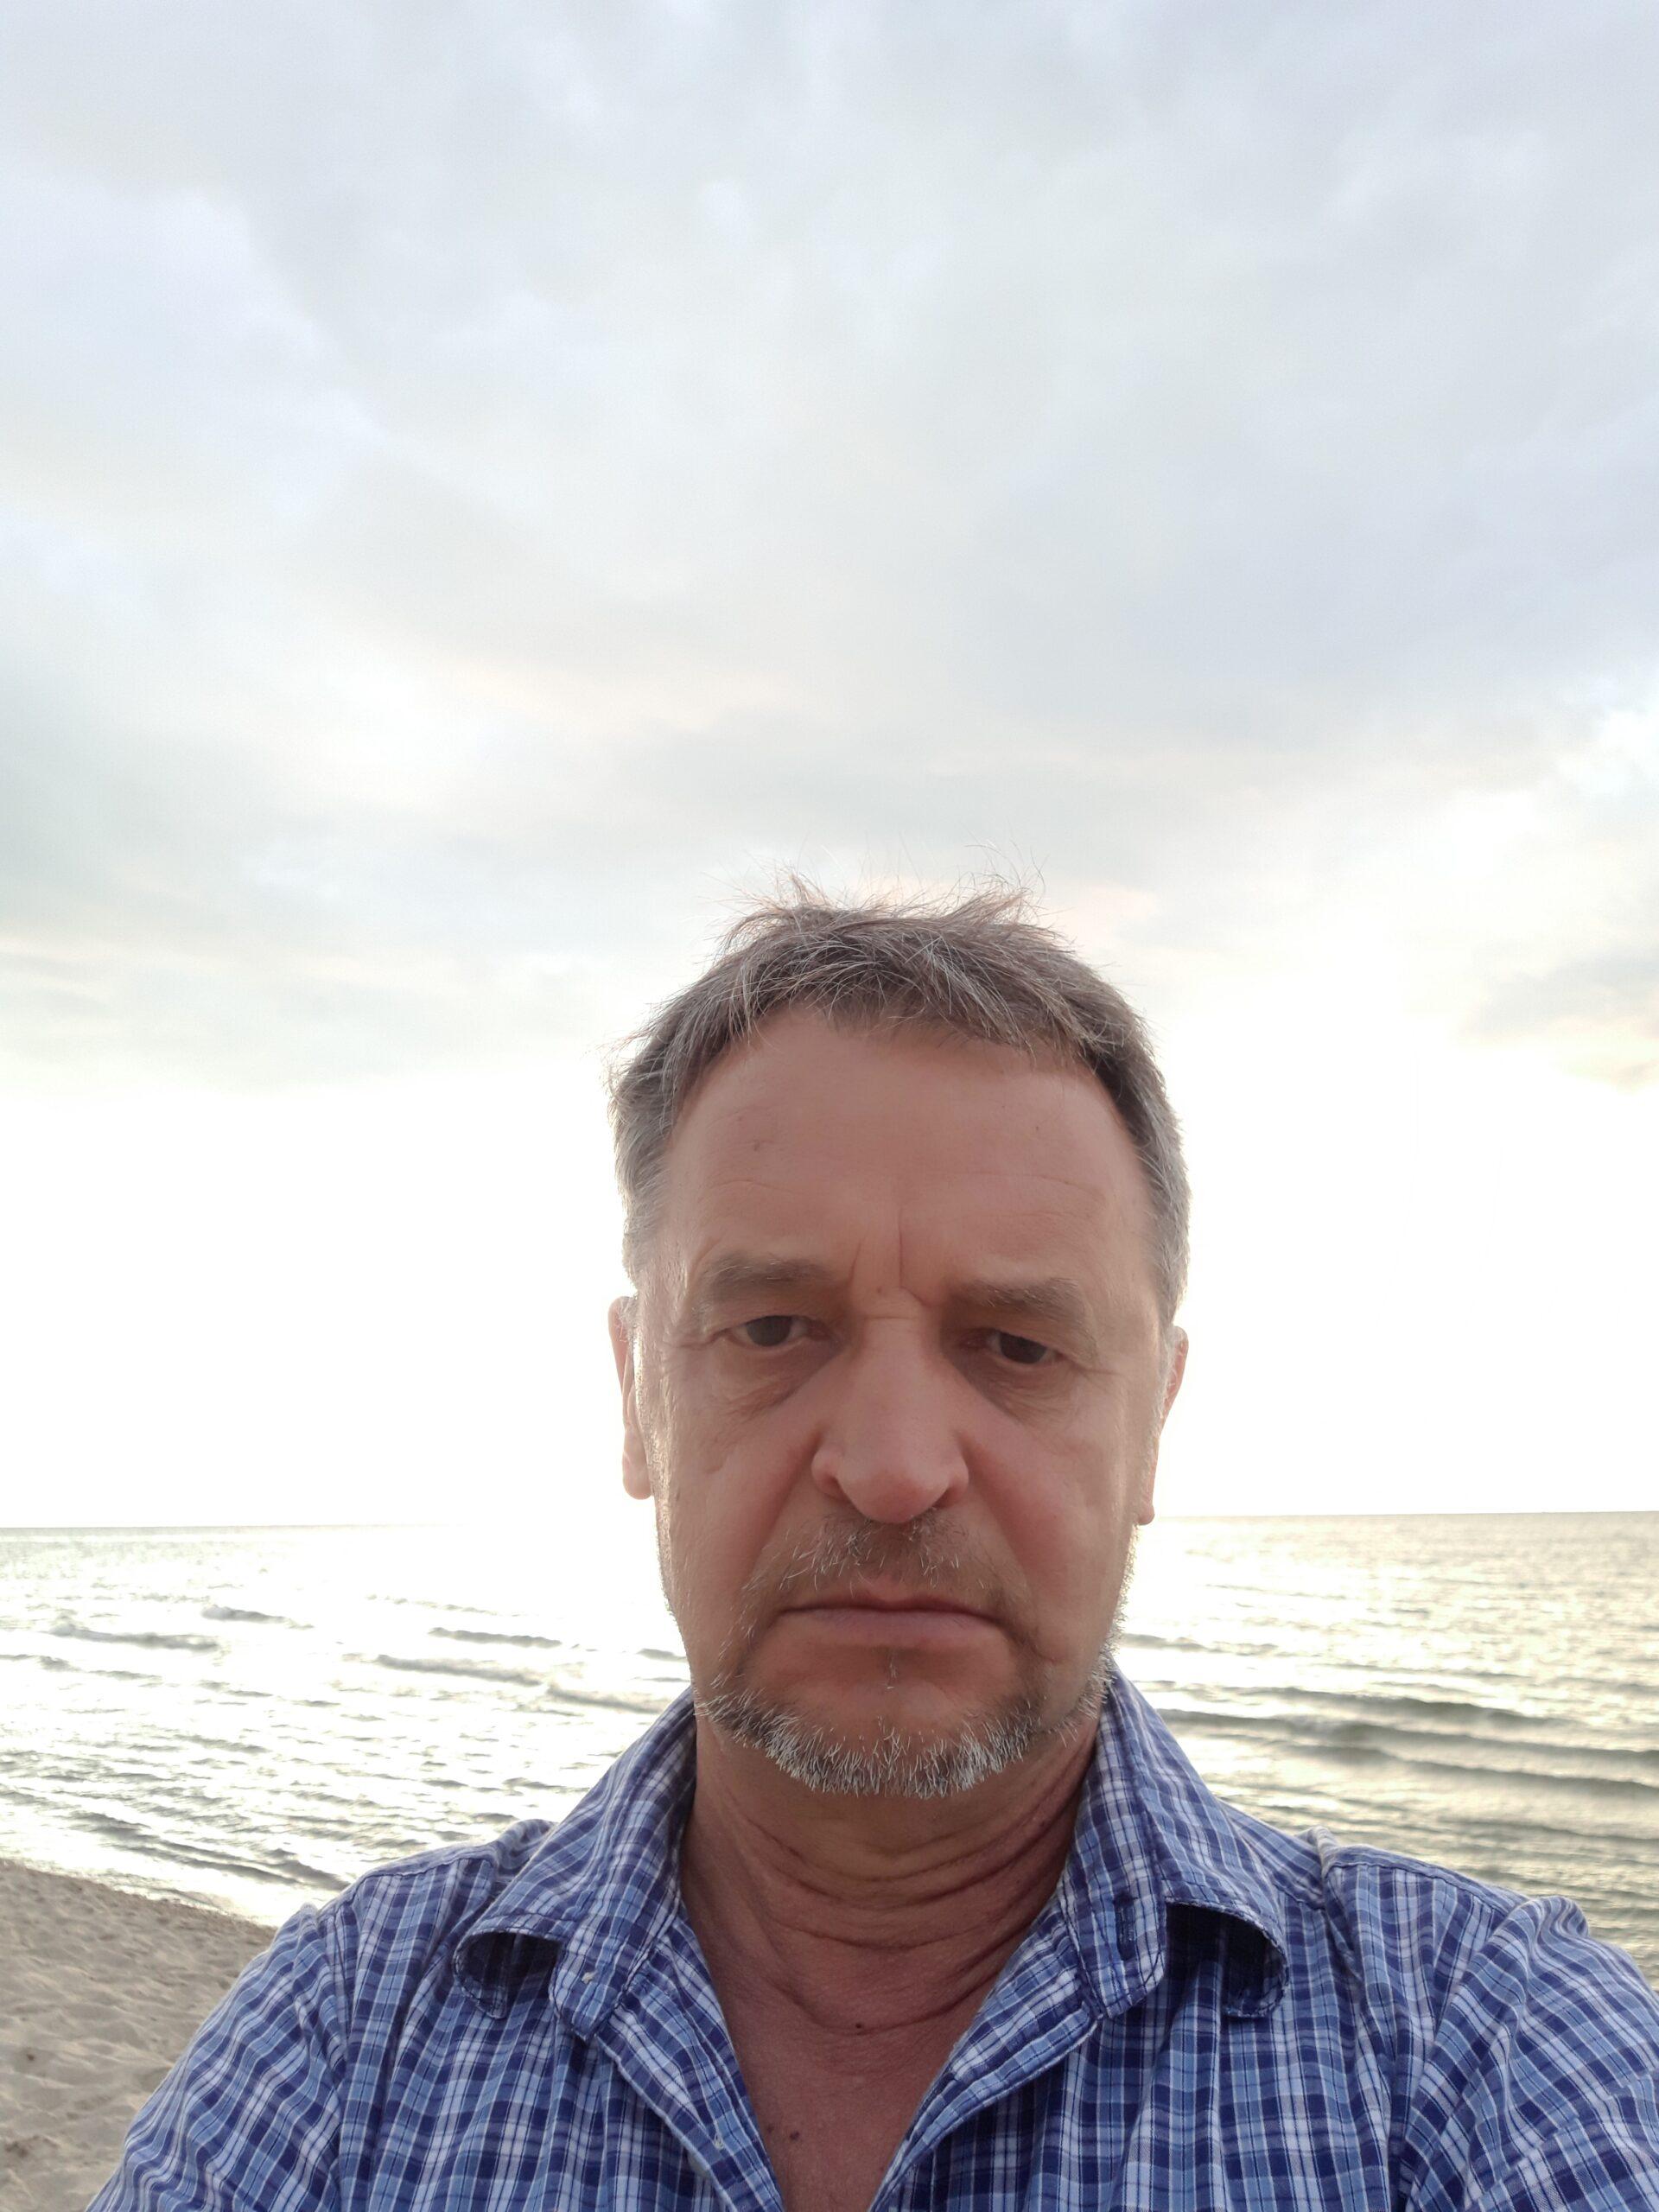 Гржибовский Евгений Васильевич